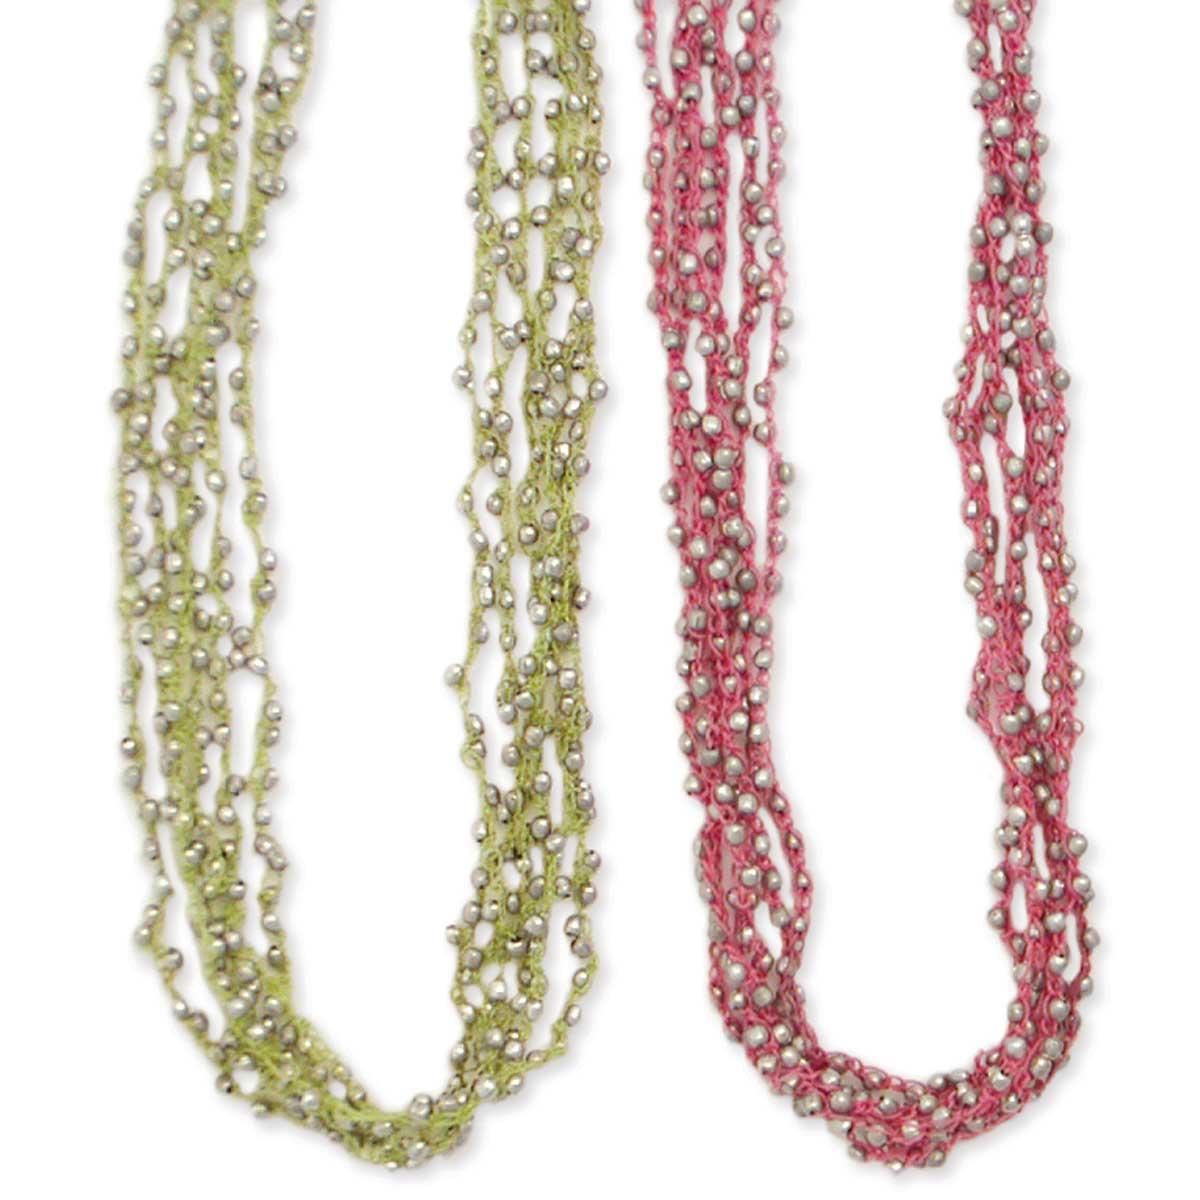 Thread & Silver Bead Necklace